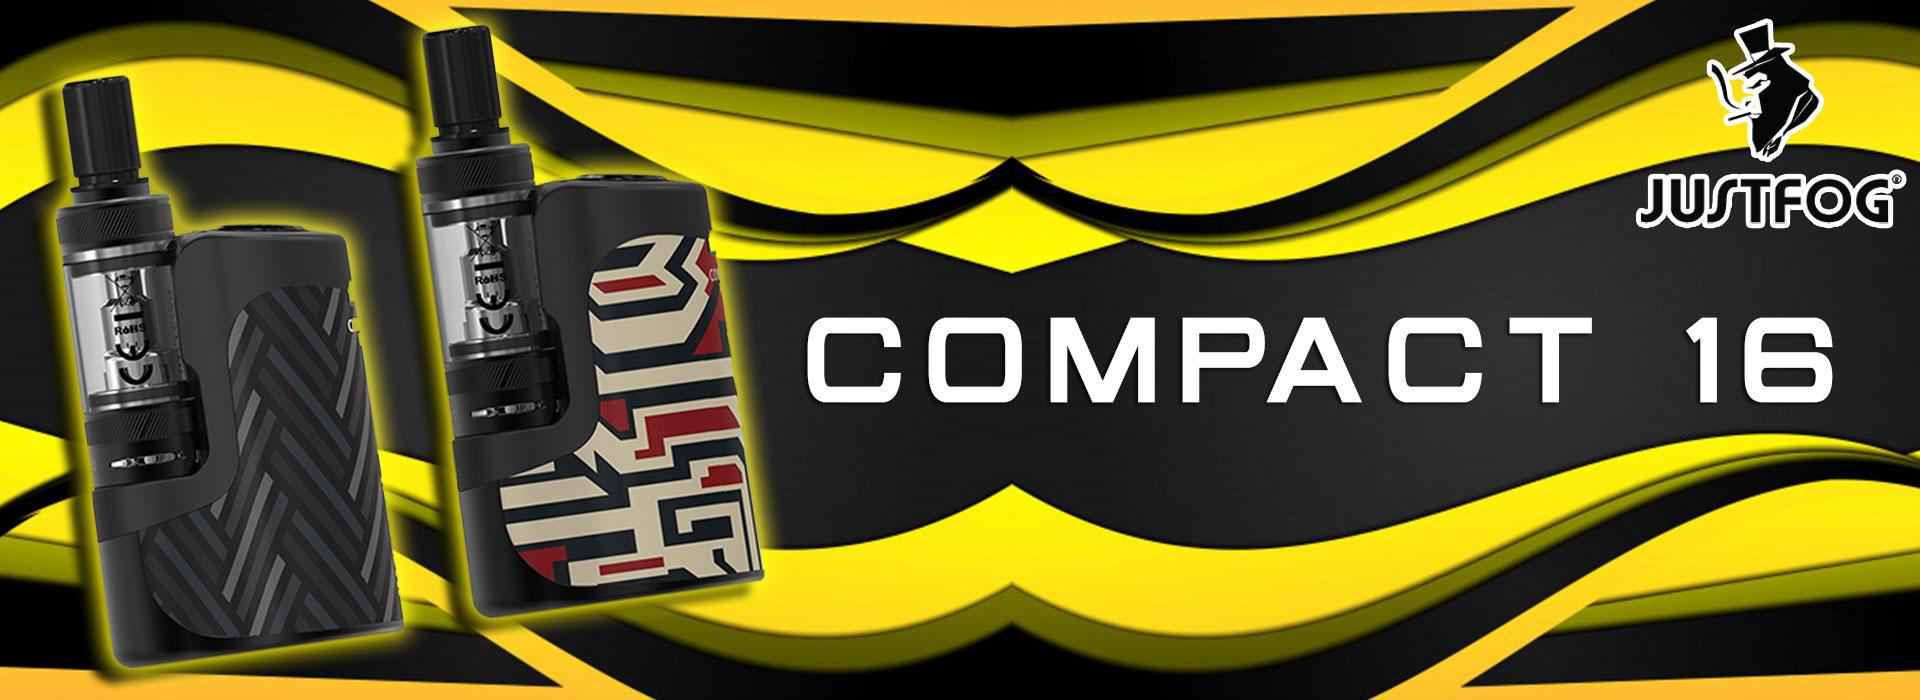 Compact 16